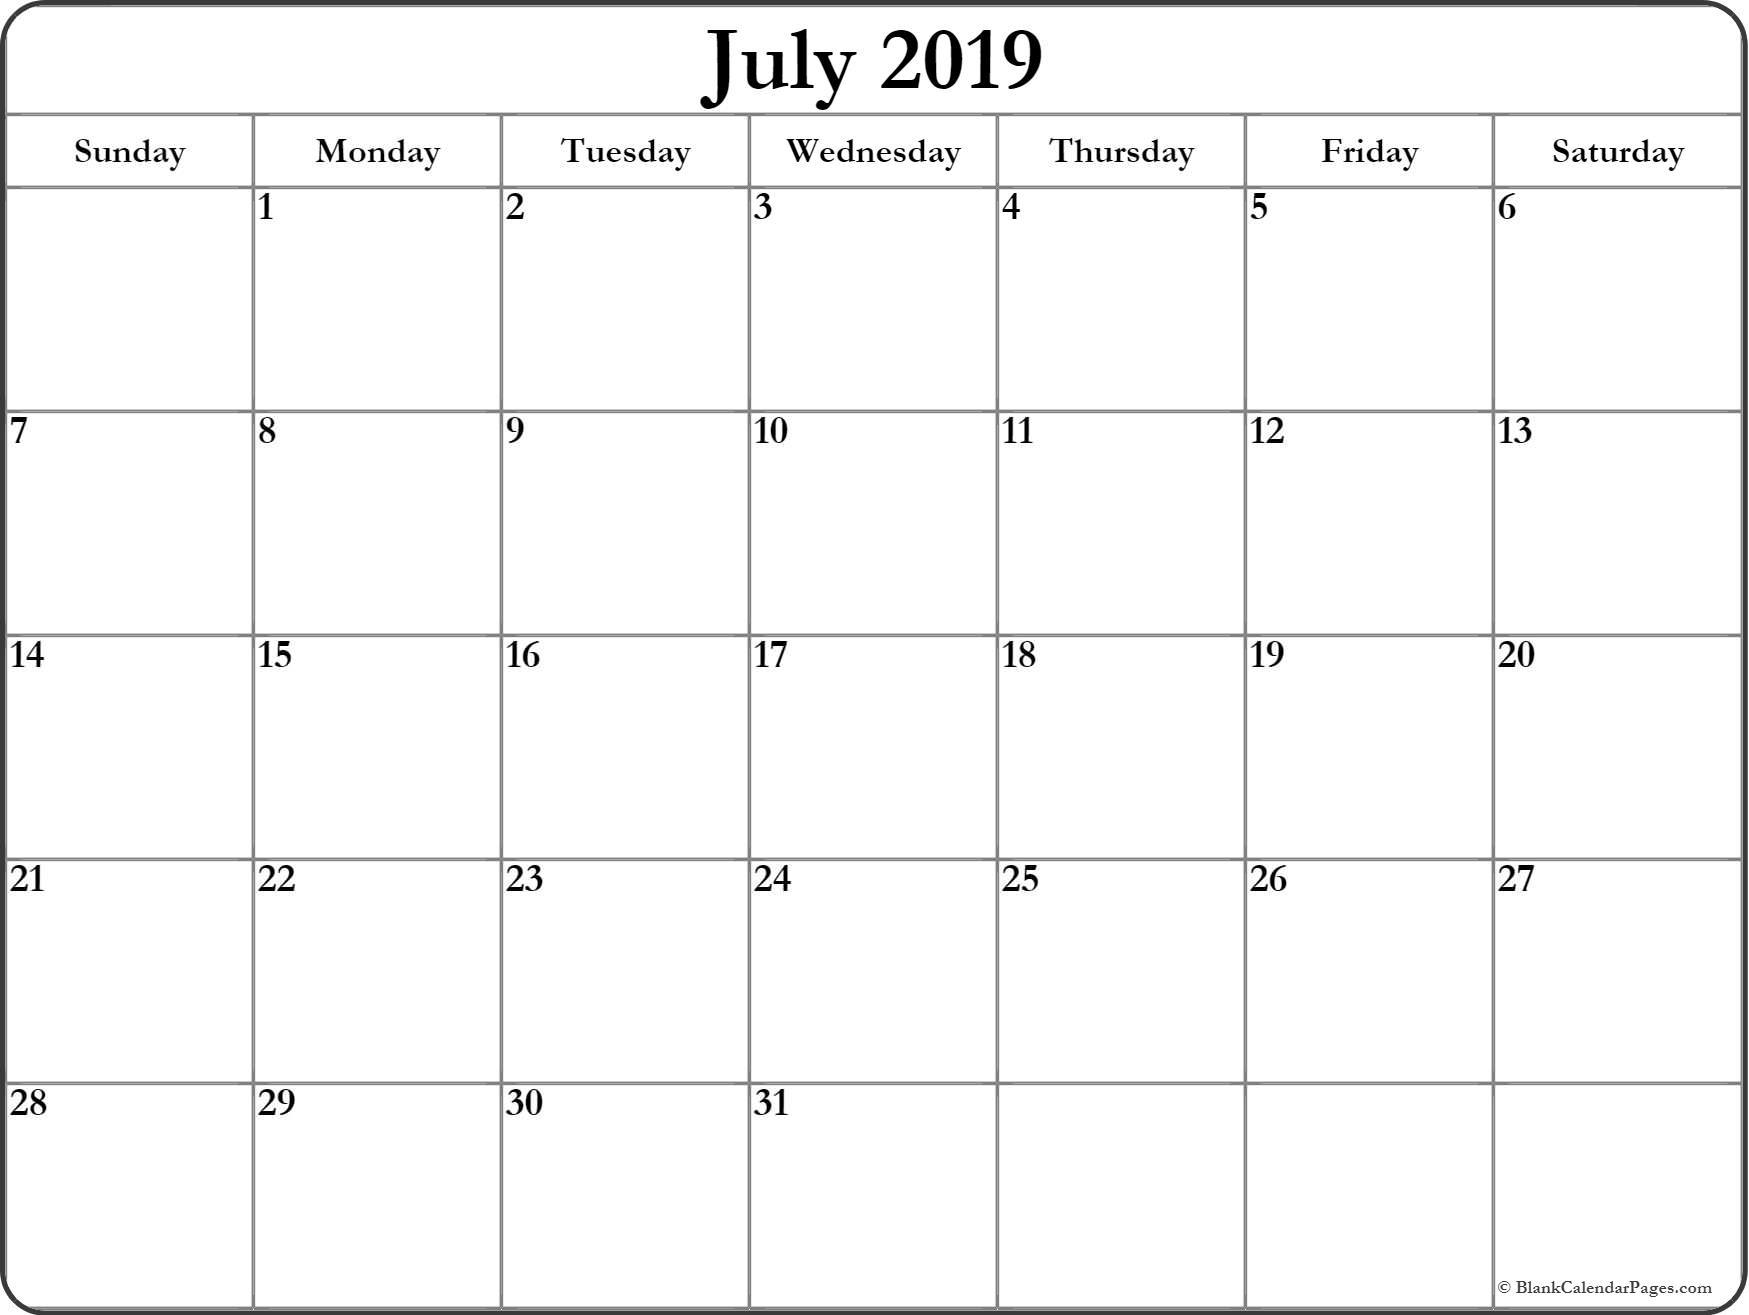 July 2019 Calendar | Free Printable Monthly Calendars pertaining to 1 Month Calendar Printable Blank